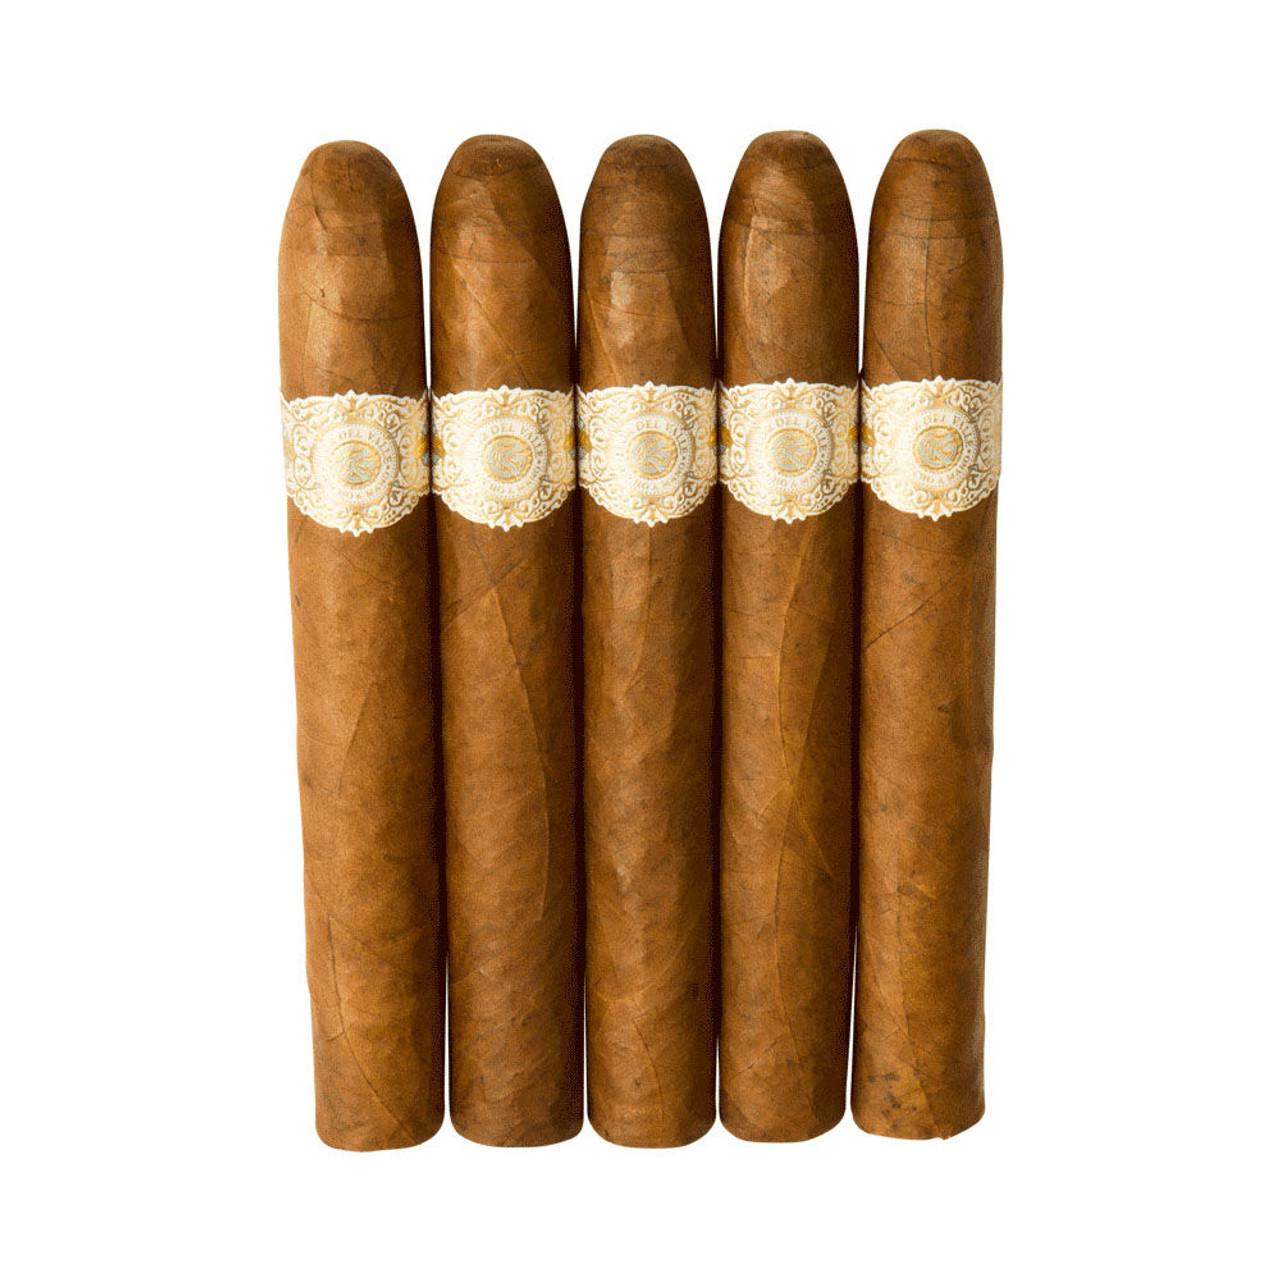 Warped Flor del Valle Seleccion De Valle Cigars - 6 x 52 (Pack of 5)